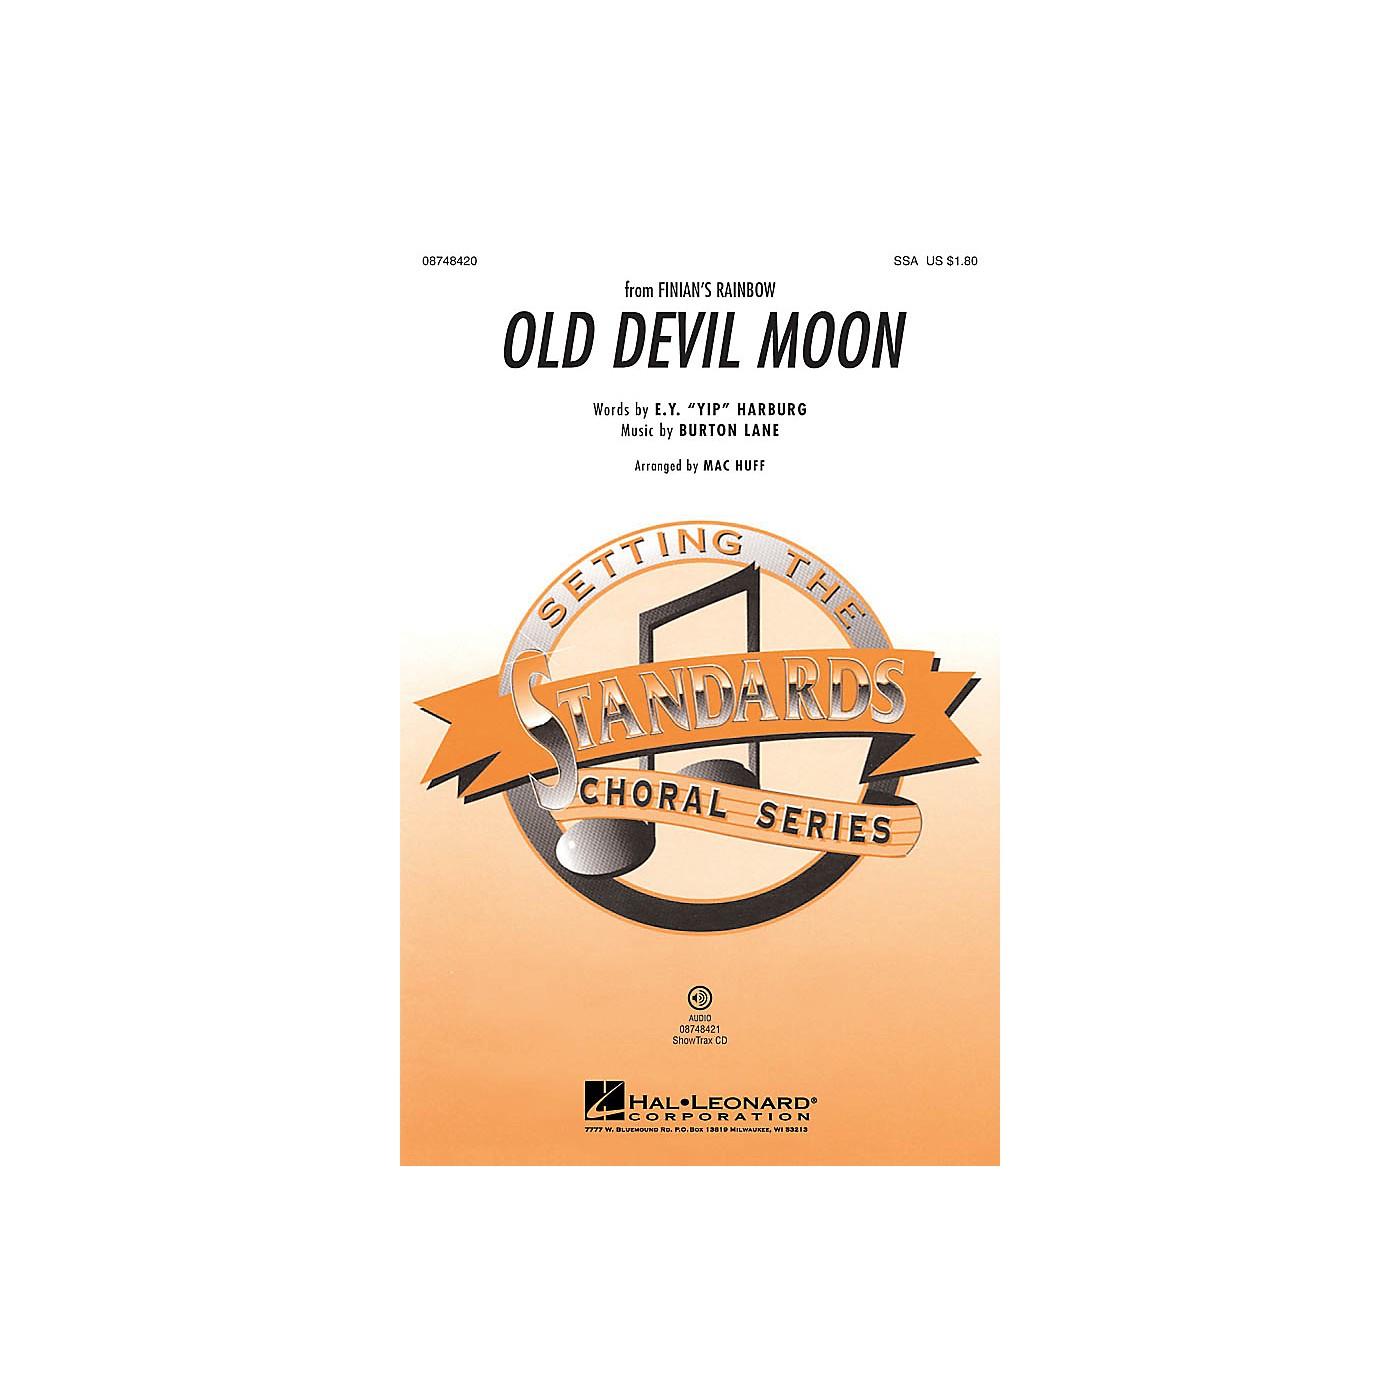 Hal Leonard Old Devil Moon (from Finian's Rainbow) ShowTrax CD Arranged by Mac Huff thumbnail